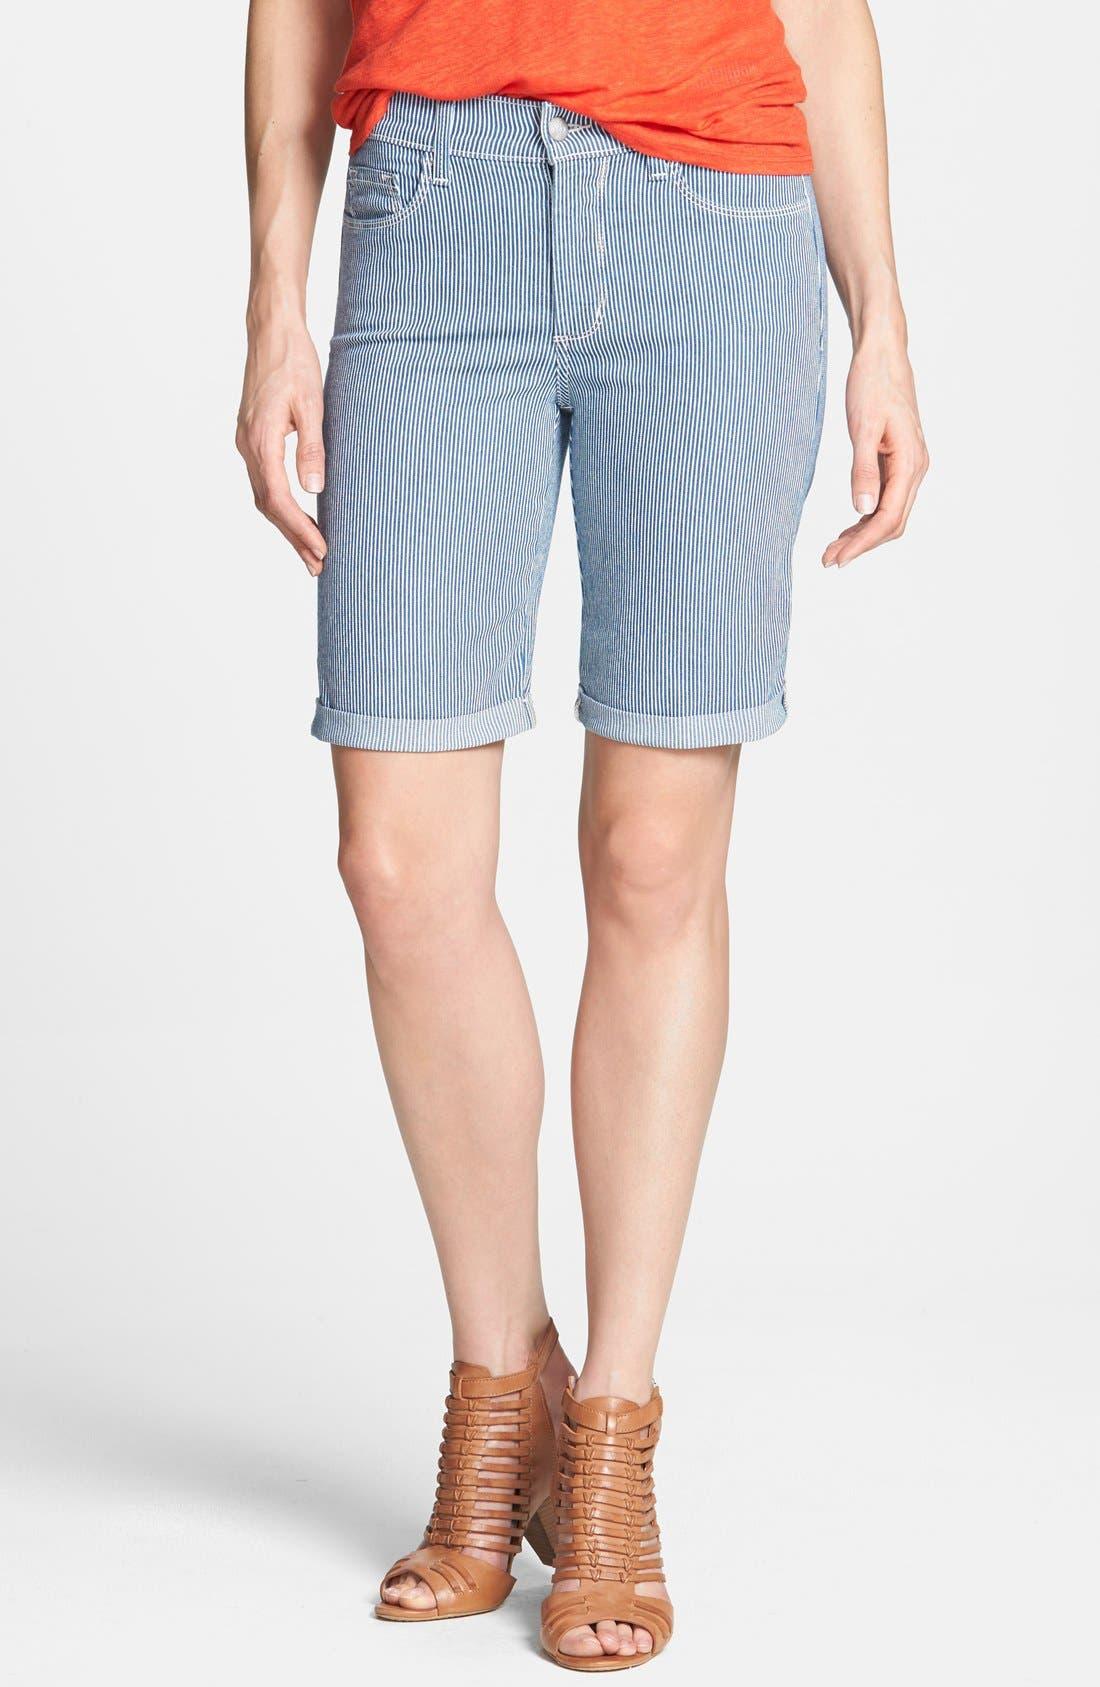 Alternate Image 1 Selected - NYDJ 'Brianna' Stretch Denim Bermuda Shorts